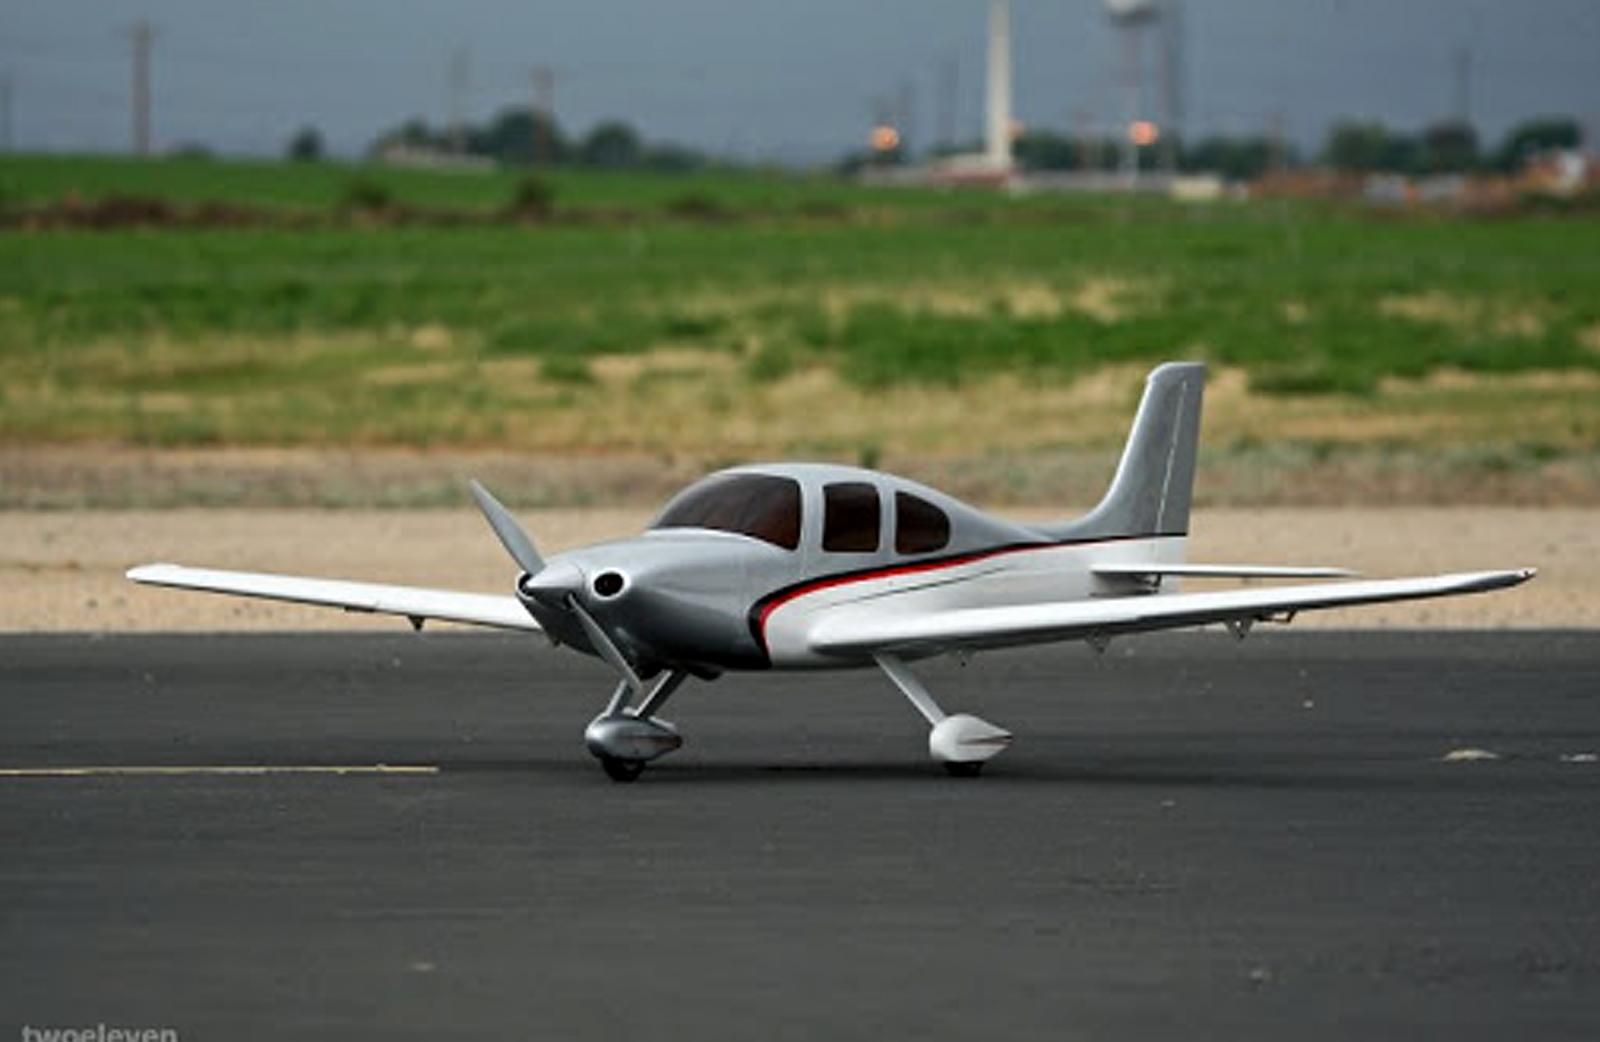 A model airplane on the runaway at Prado park airfield.